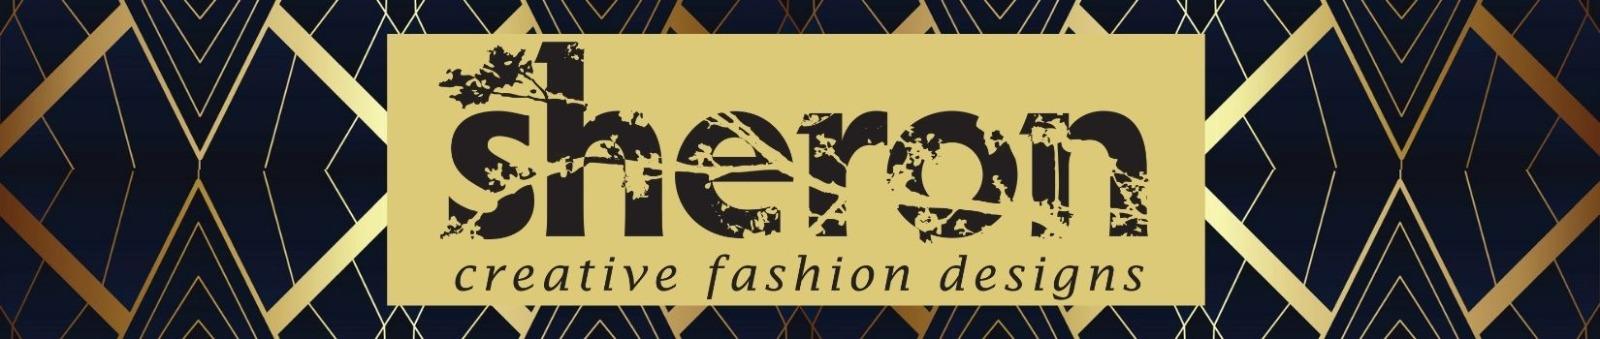 Sheron Designs